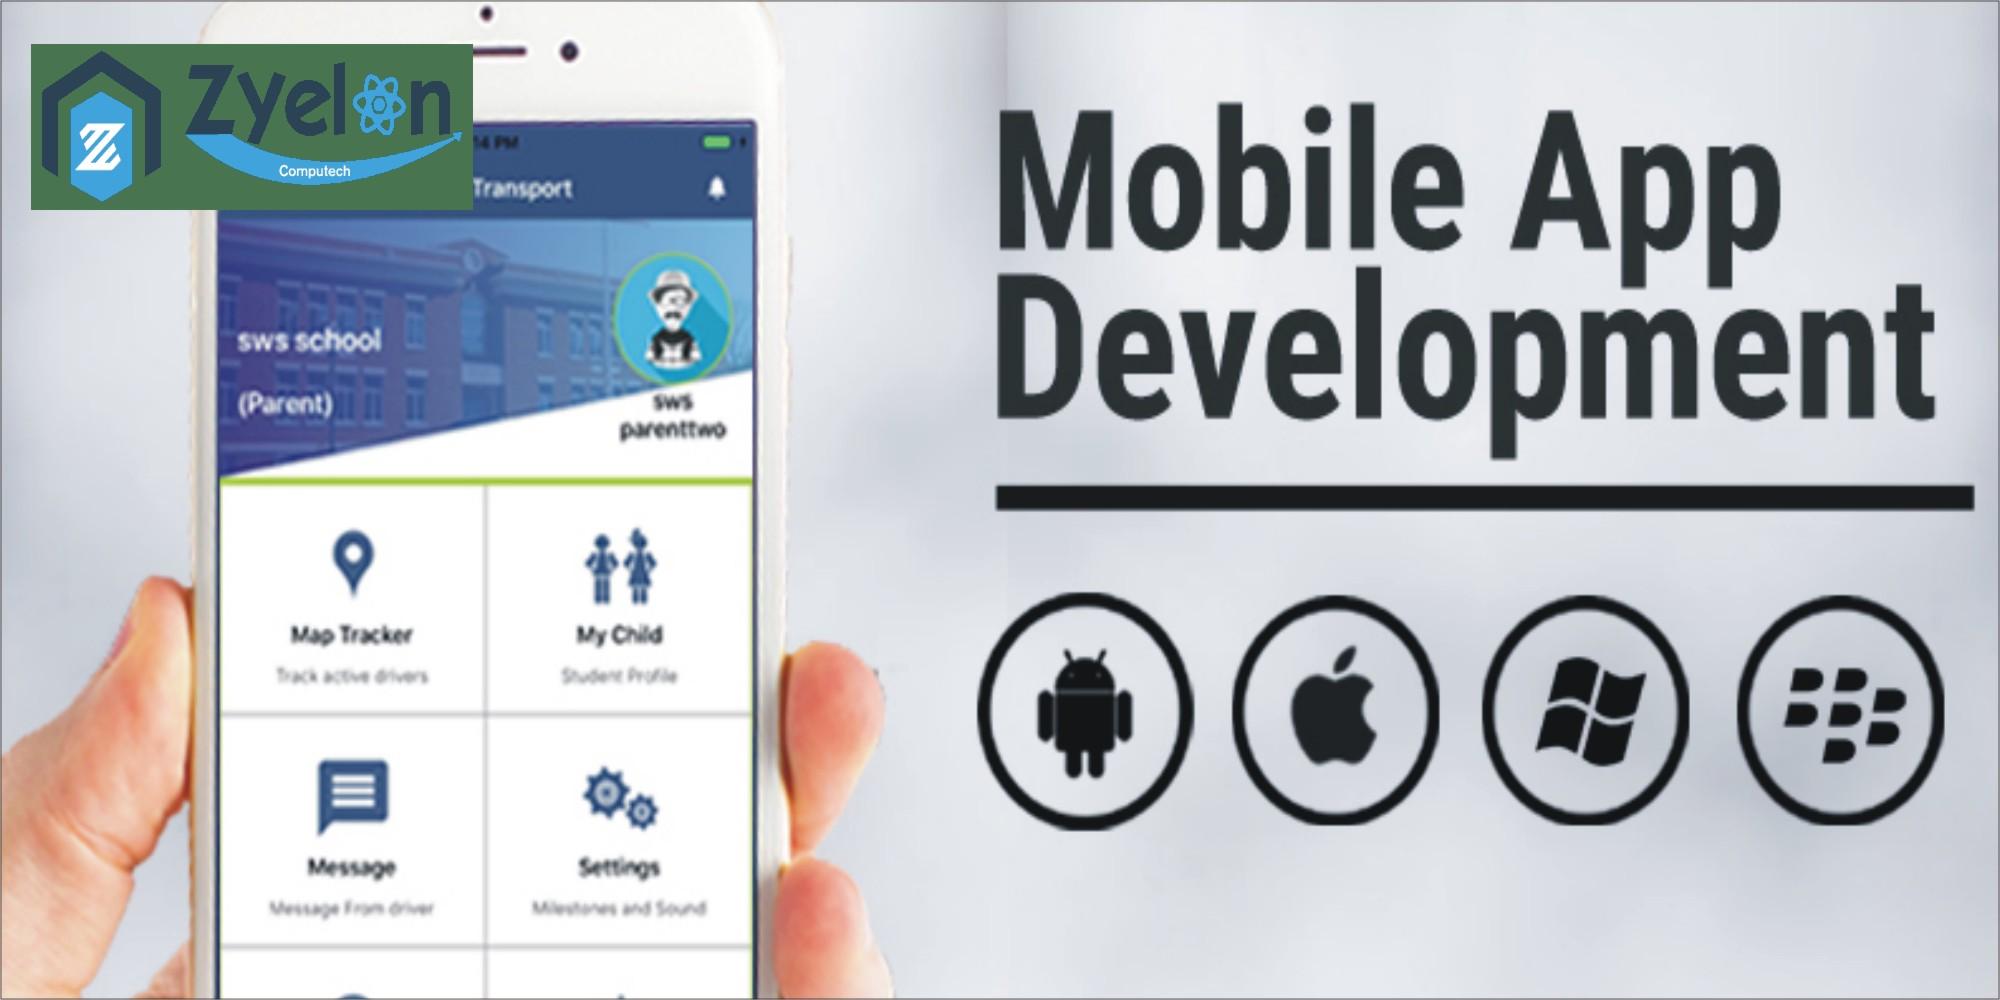 Magento E-commerce Development and Mobile Apps Development Company